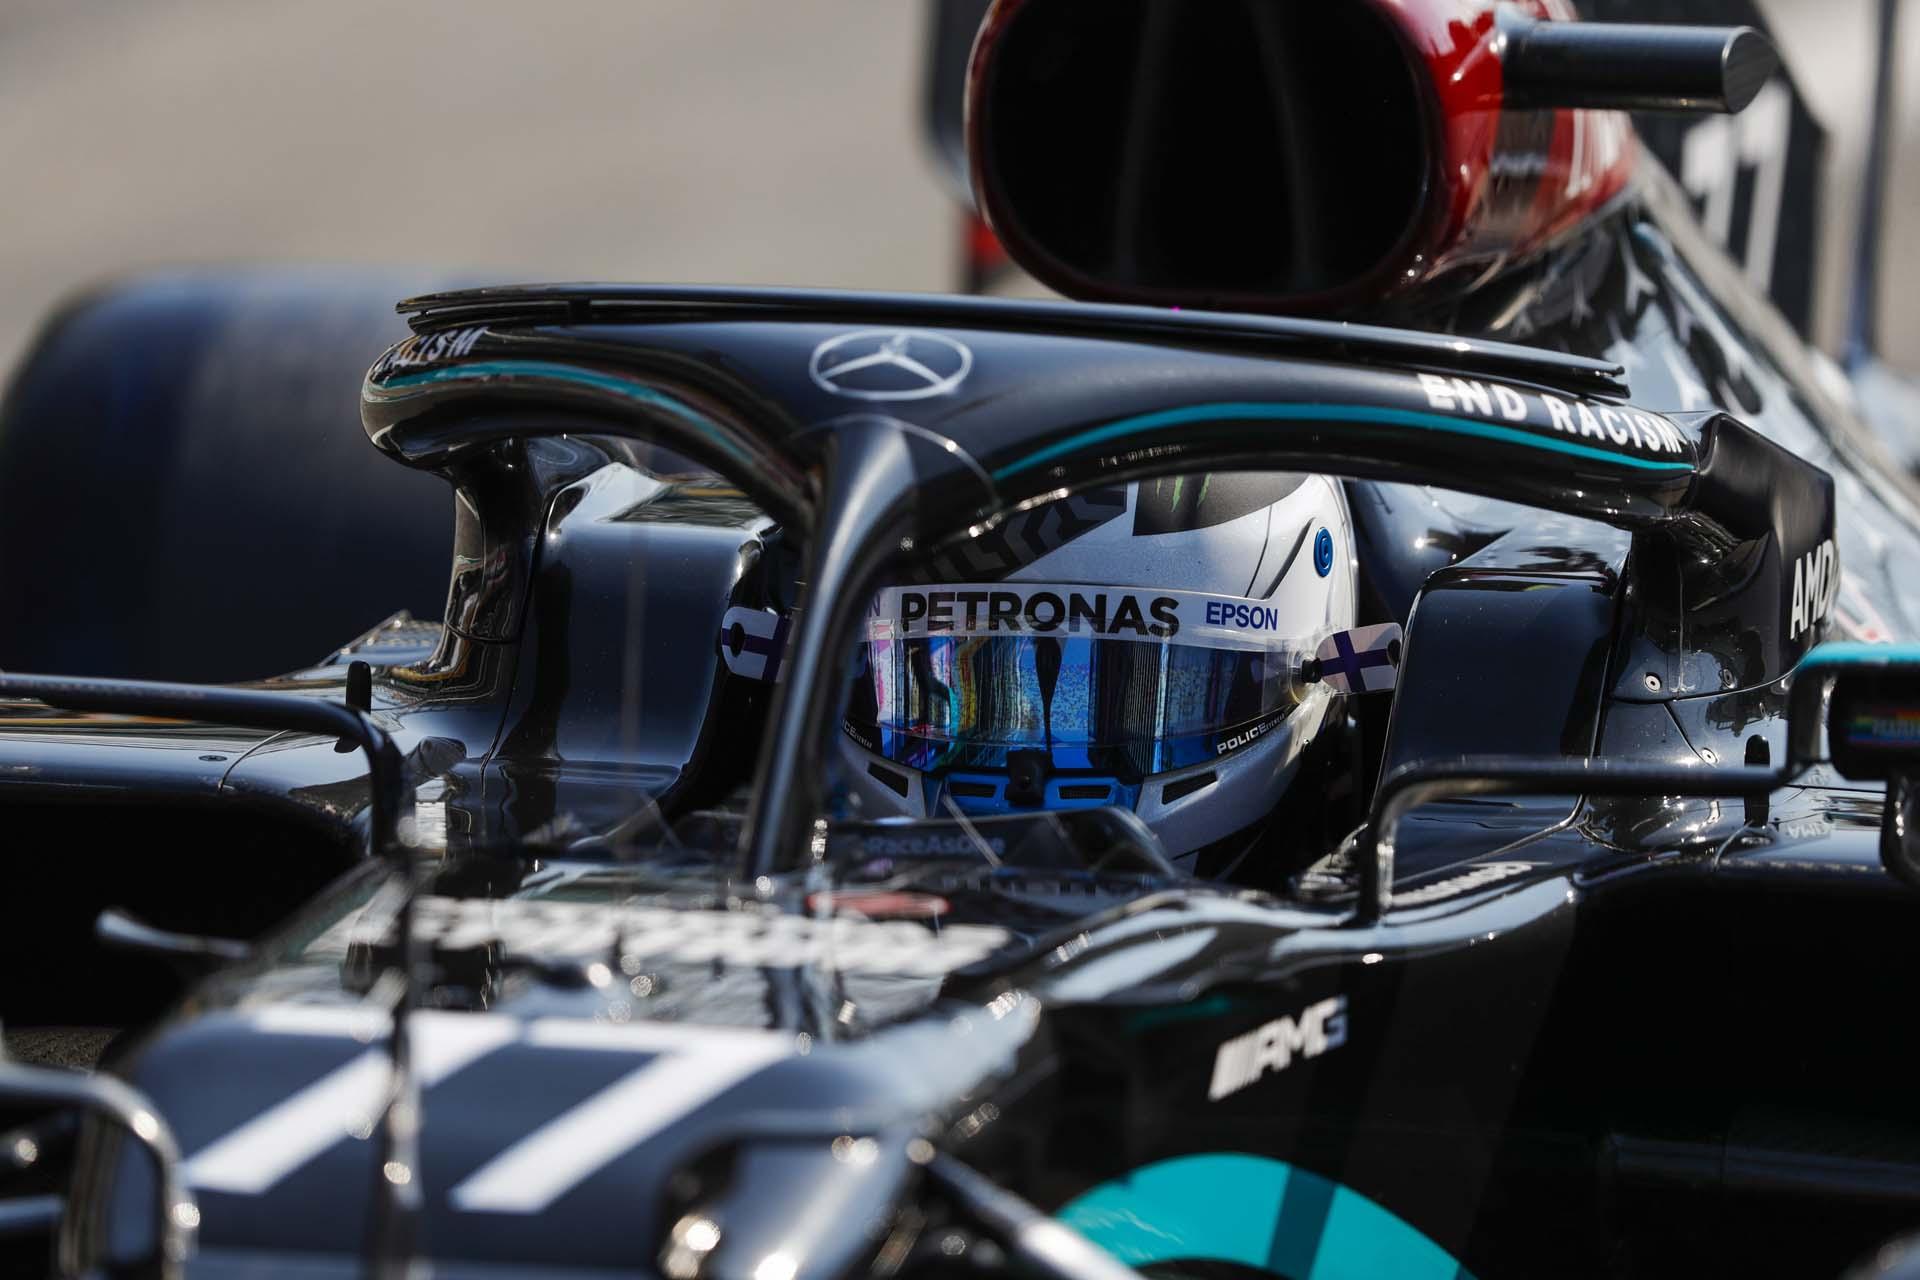 2020 Italian Grand Prix, Friday - LAT Images